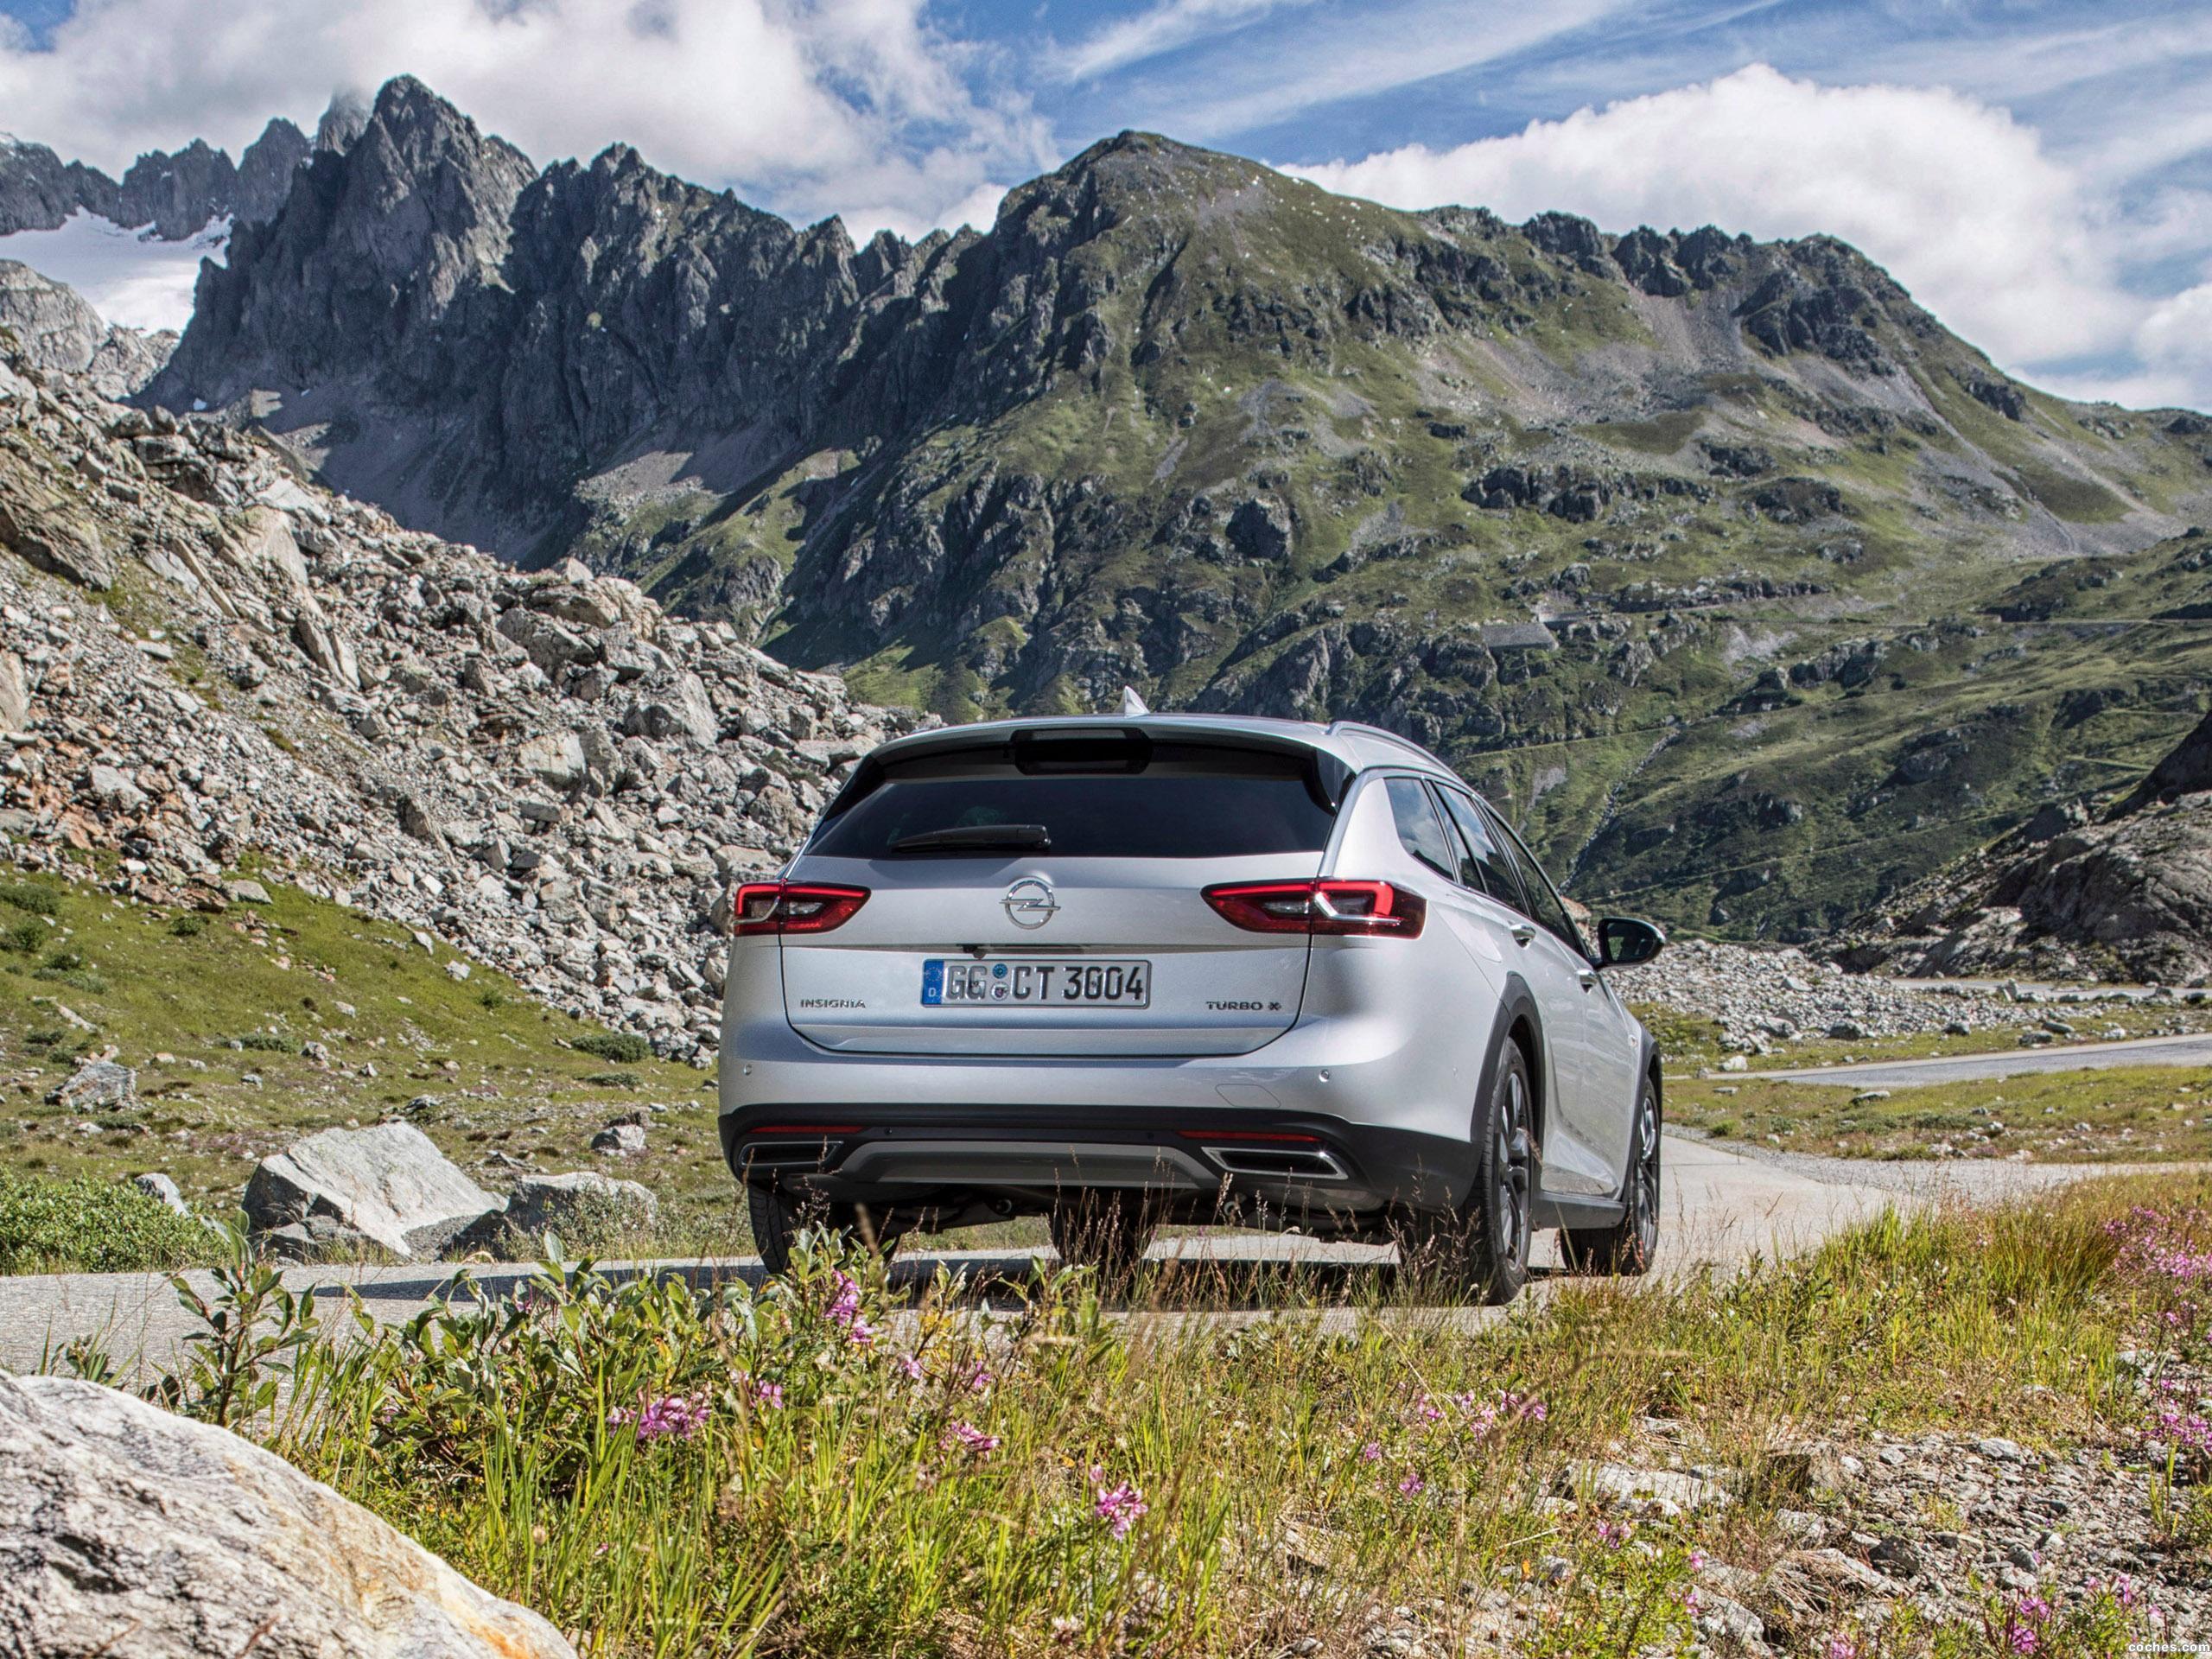 Foto 27 de Opel Insignia Country Tourer Turbo 4x4 2017